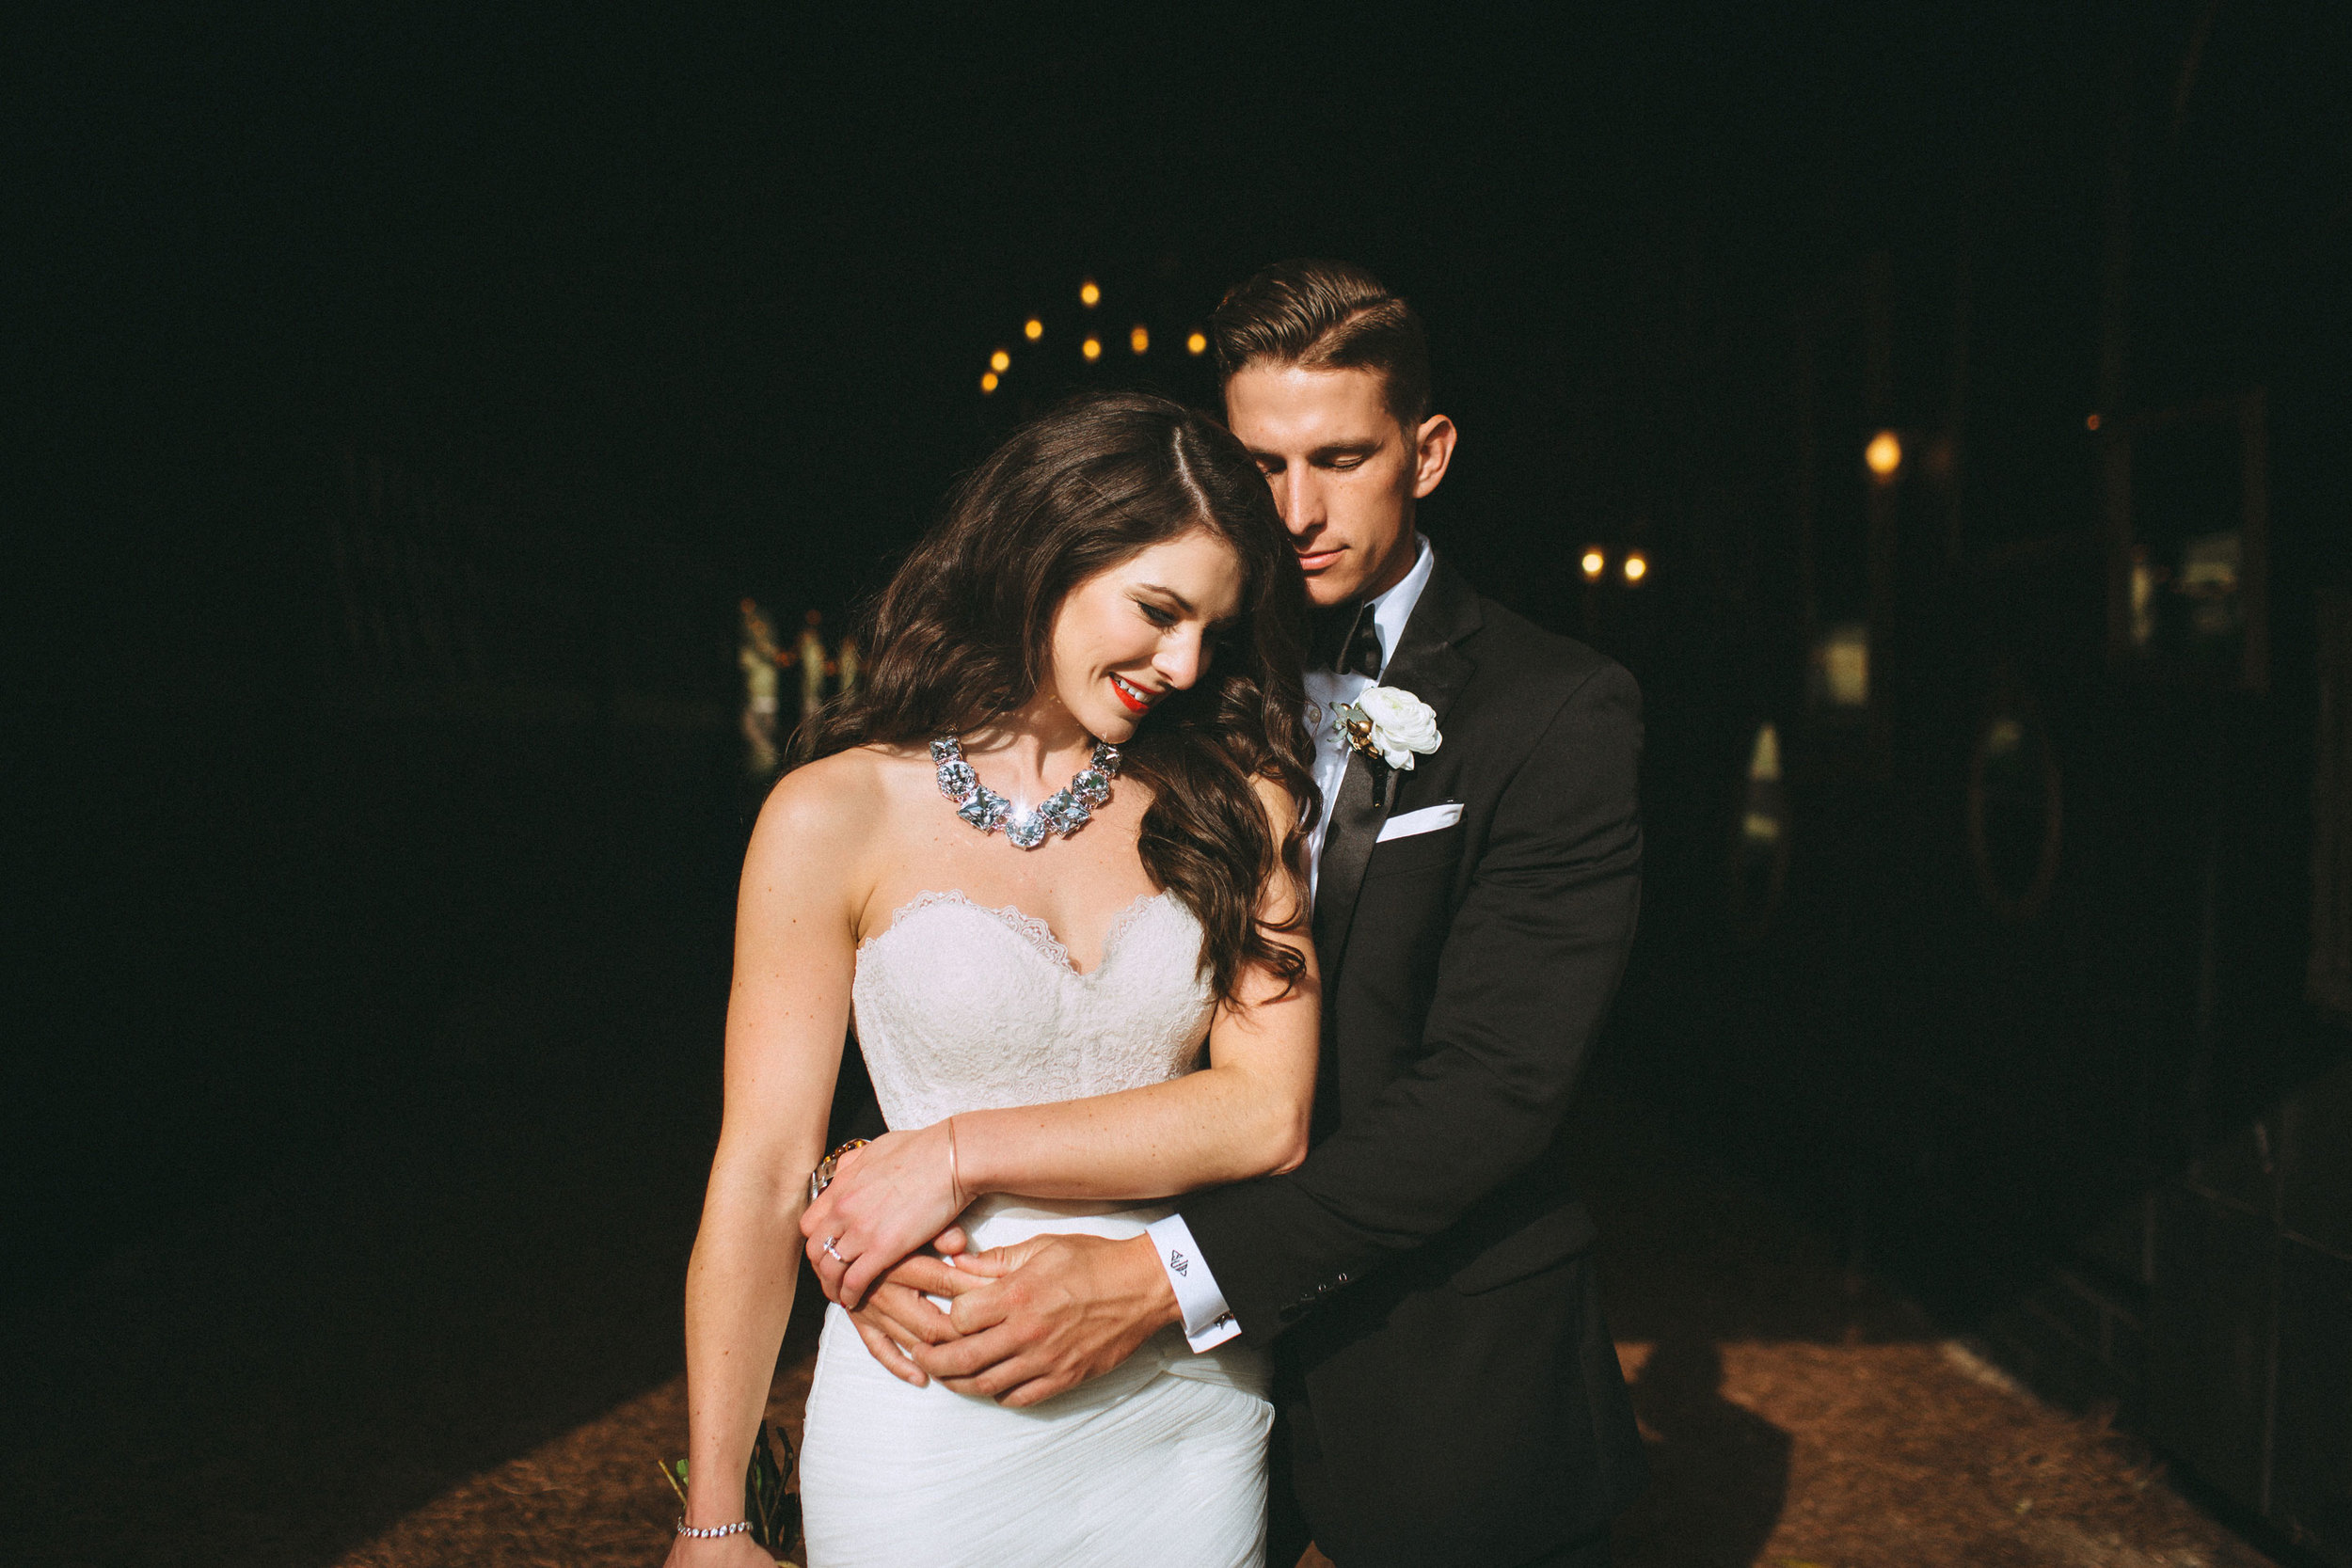 Me & Mr. Jones Wedding, Watters Carina Corset, Watters Amina Skirt, Bridal Separates, Rustic Glam Wedding, Black Tie Wedding, Barn Wedding